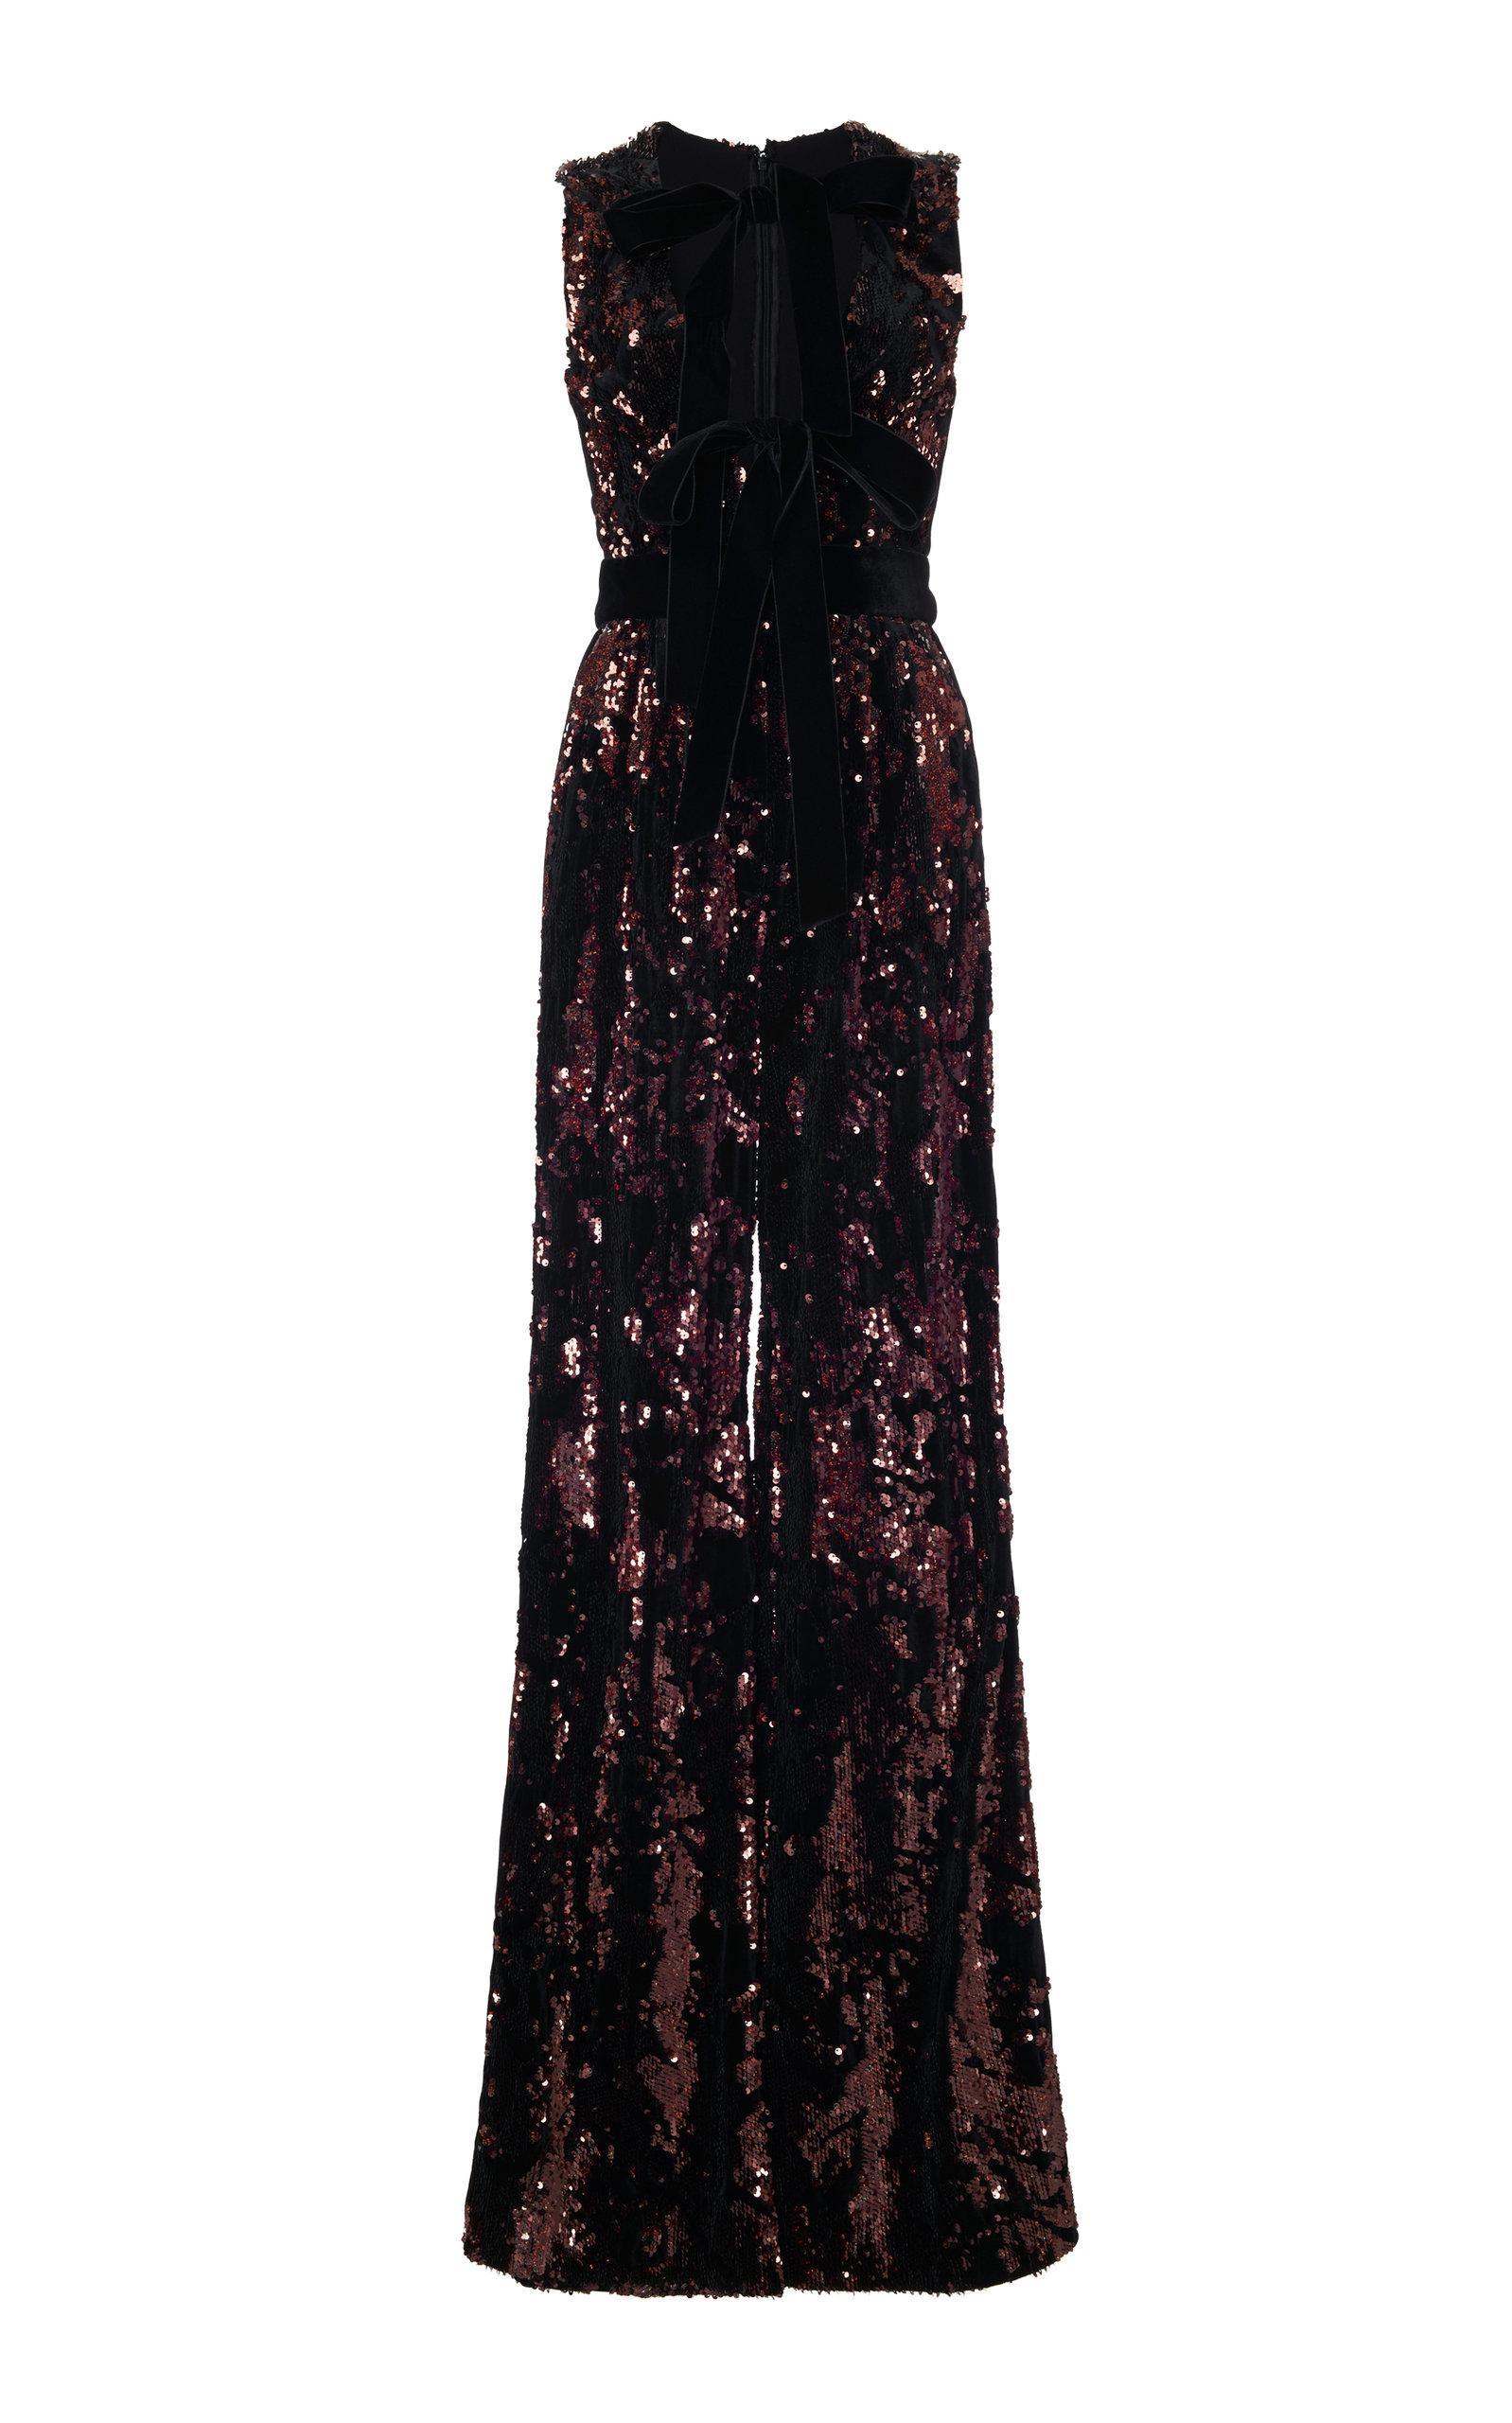 9e0a52f18cd Elie Saab Sleeveless Wide-Leg Paillette Jumpsuit W  Velvet Bow In Burgundy